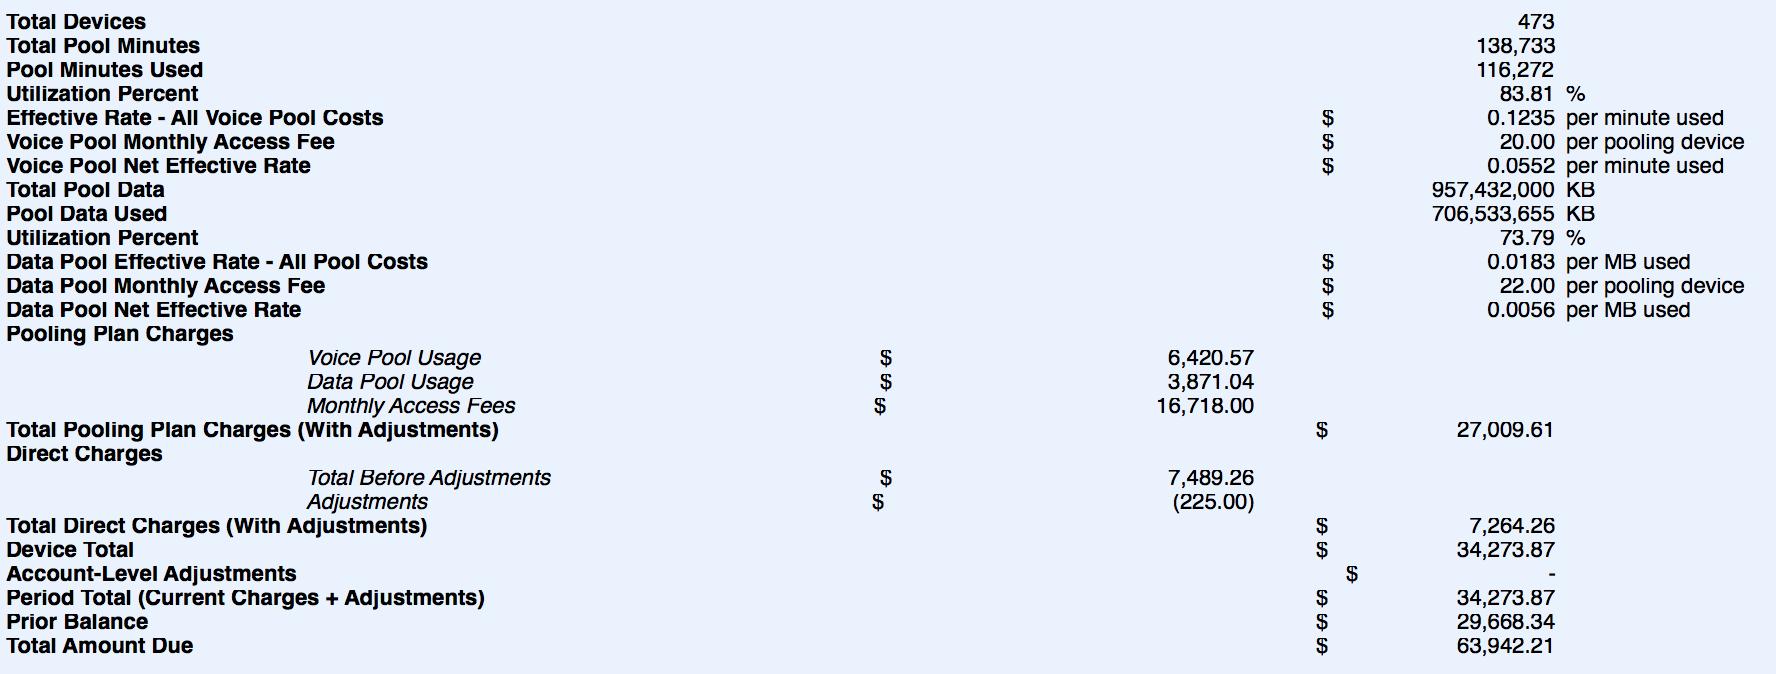 Sample EAPL Data Summary